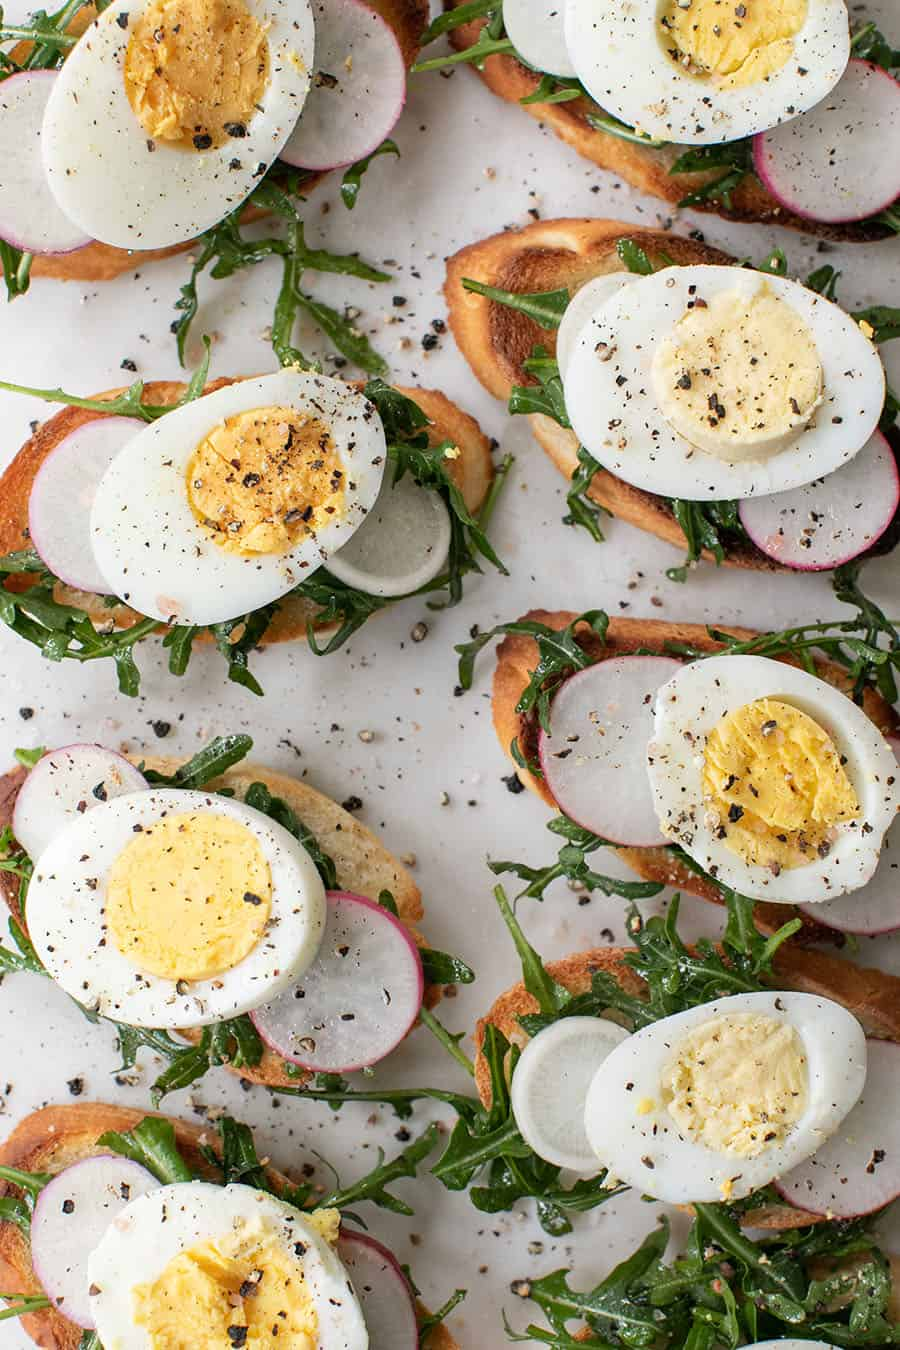 Crostini recipe with hard boiled eggs, radish, arugula and salt and pepper.